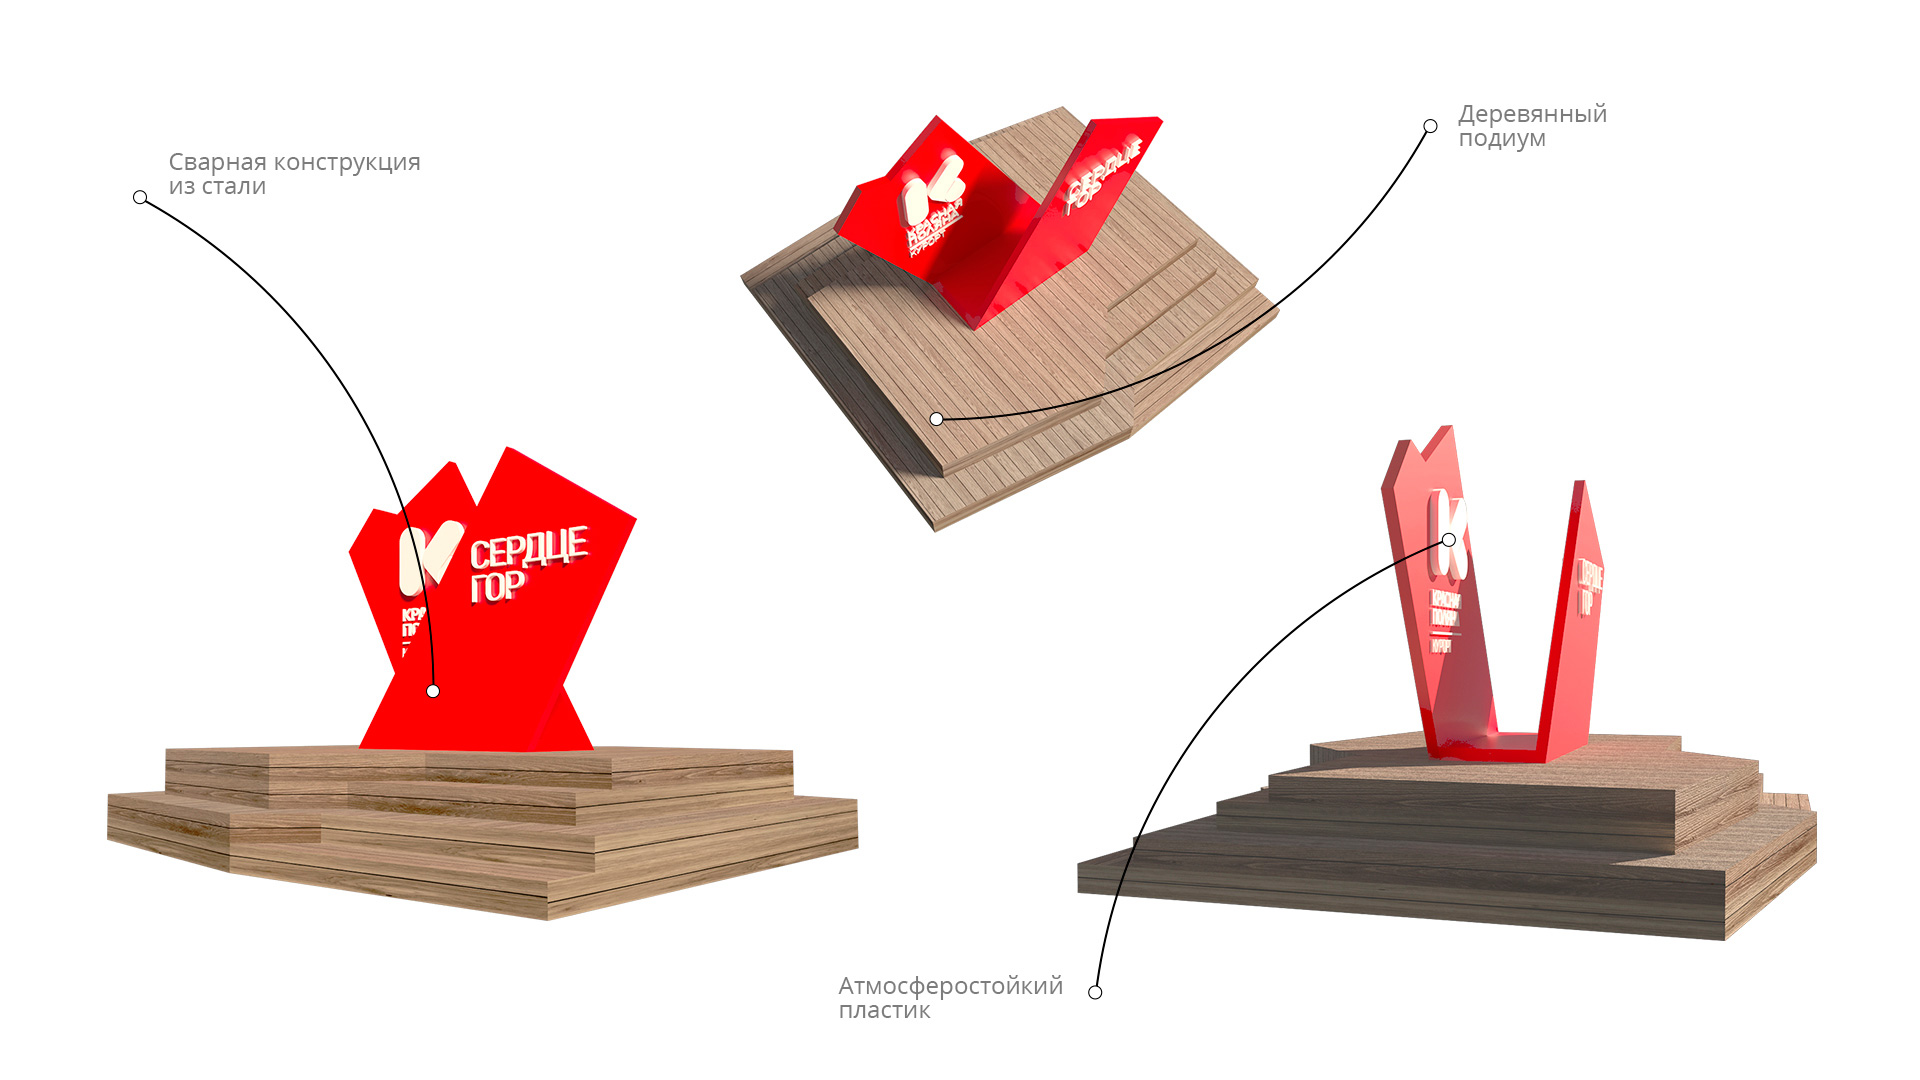 Asgard Branding, Krasnaya Polyana resort, resort, design, арт объект, сердце гор, mountain heart, дизайн арт-объектов, 3D project